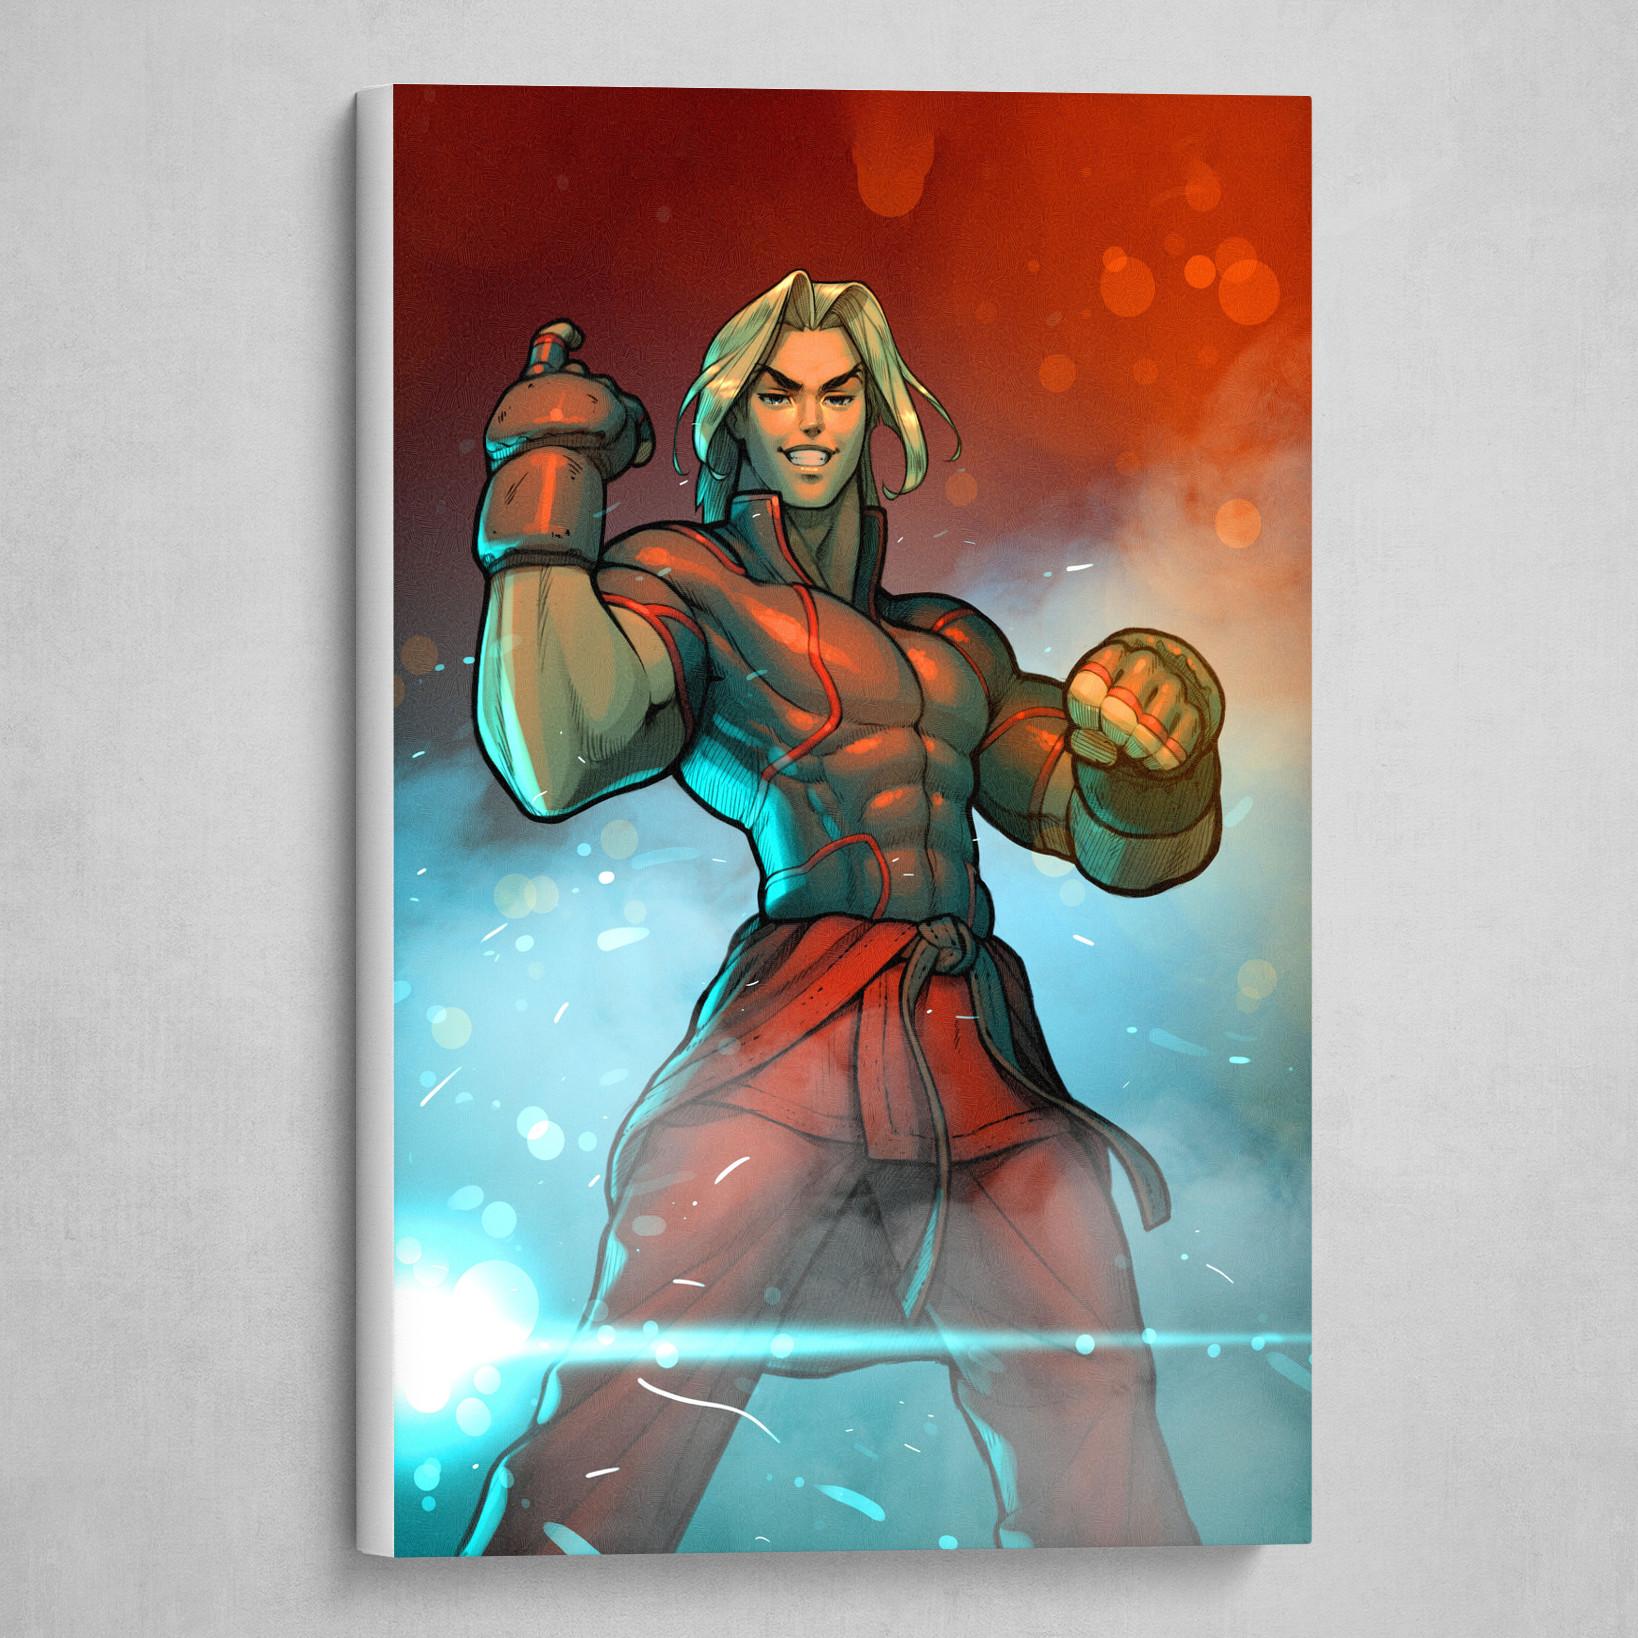 Ken - Street Fighter